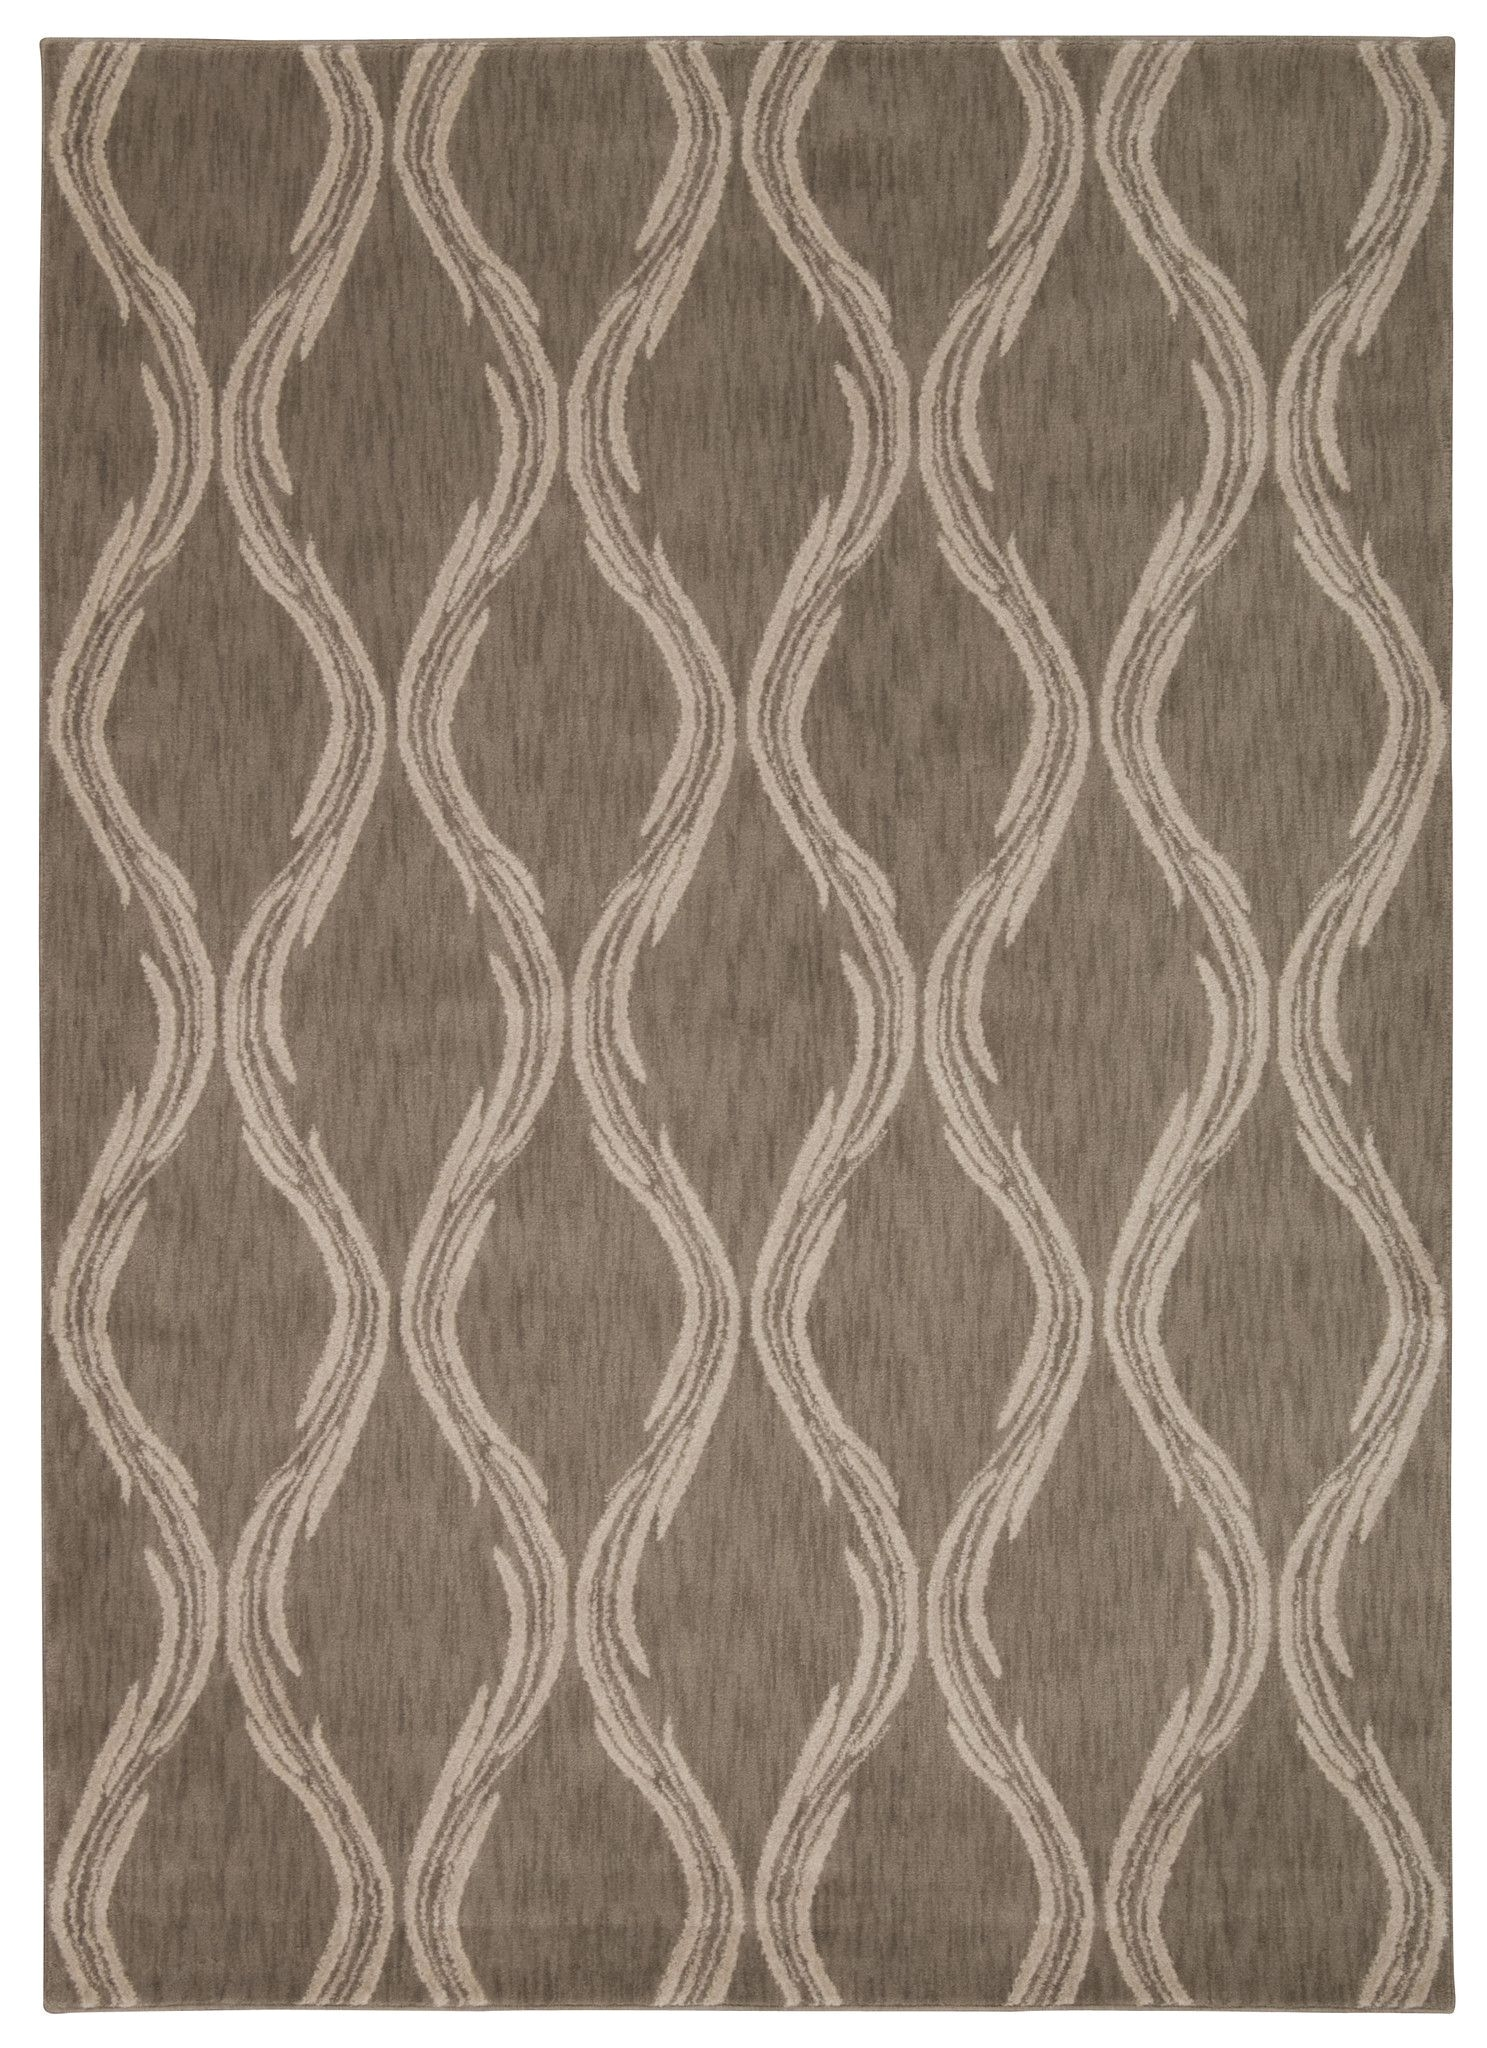 nourison tranquility taupe area rug tnq02 tau rectangle